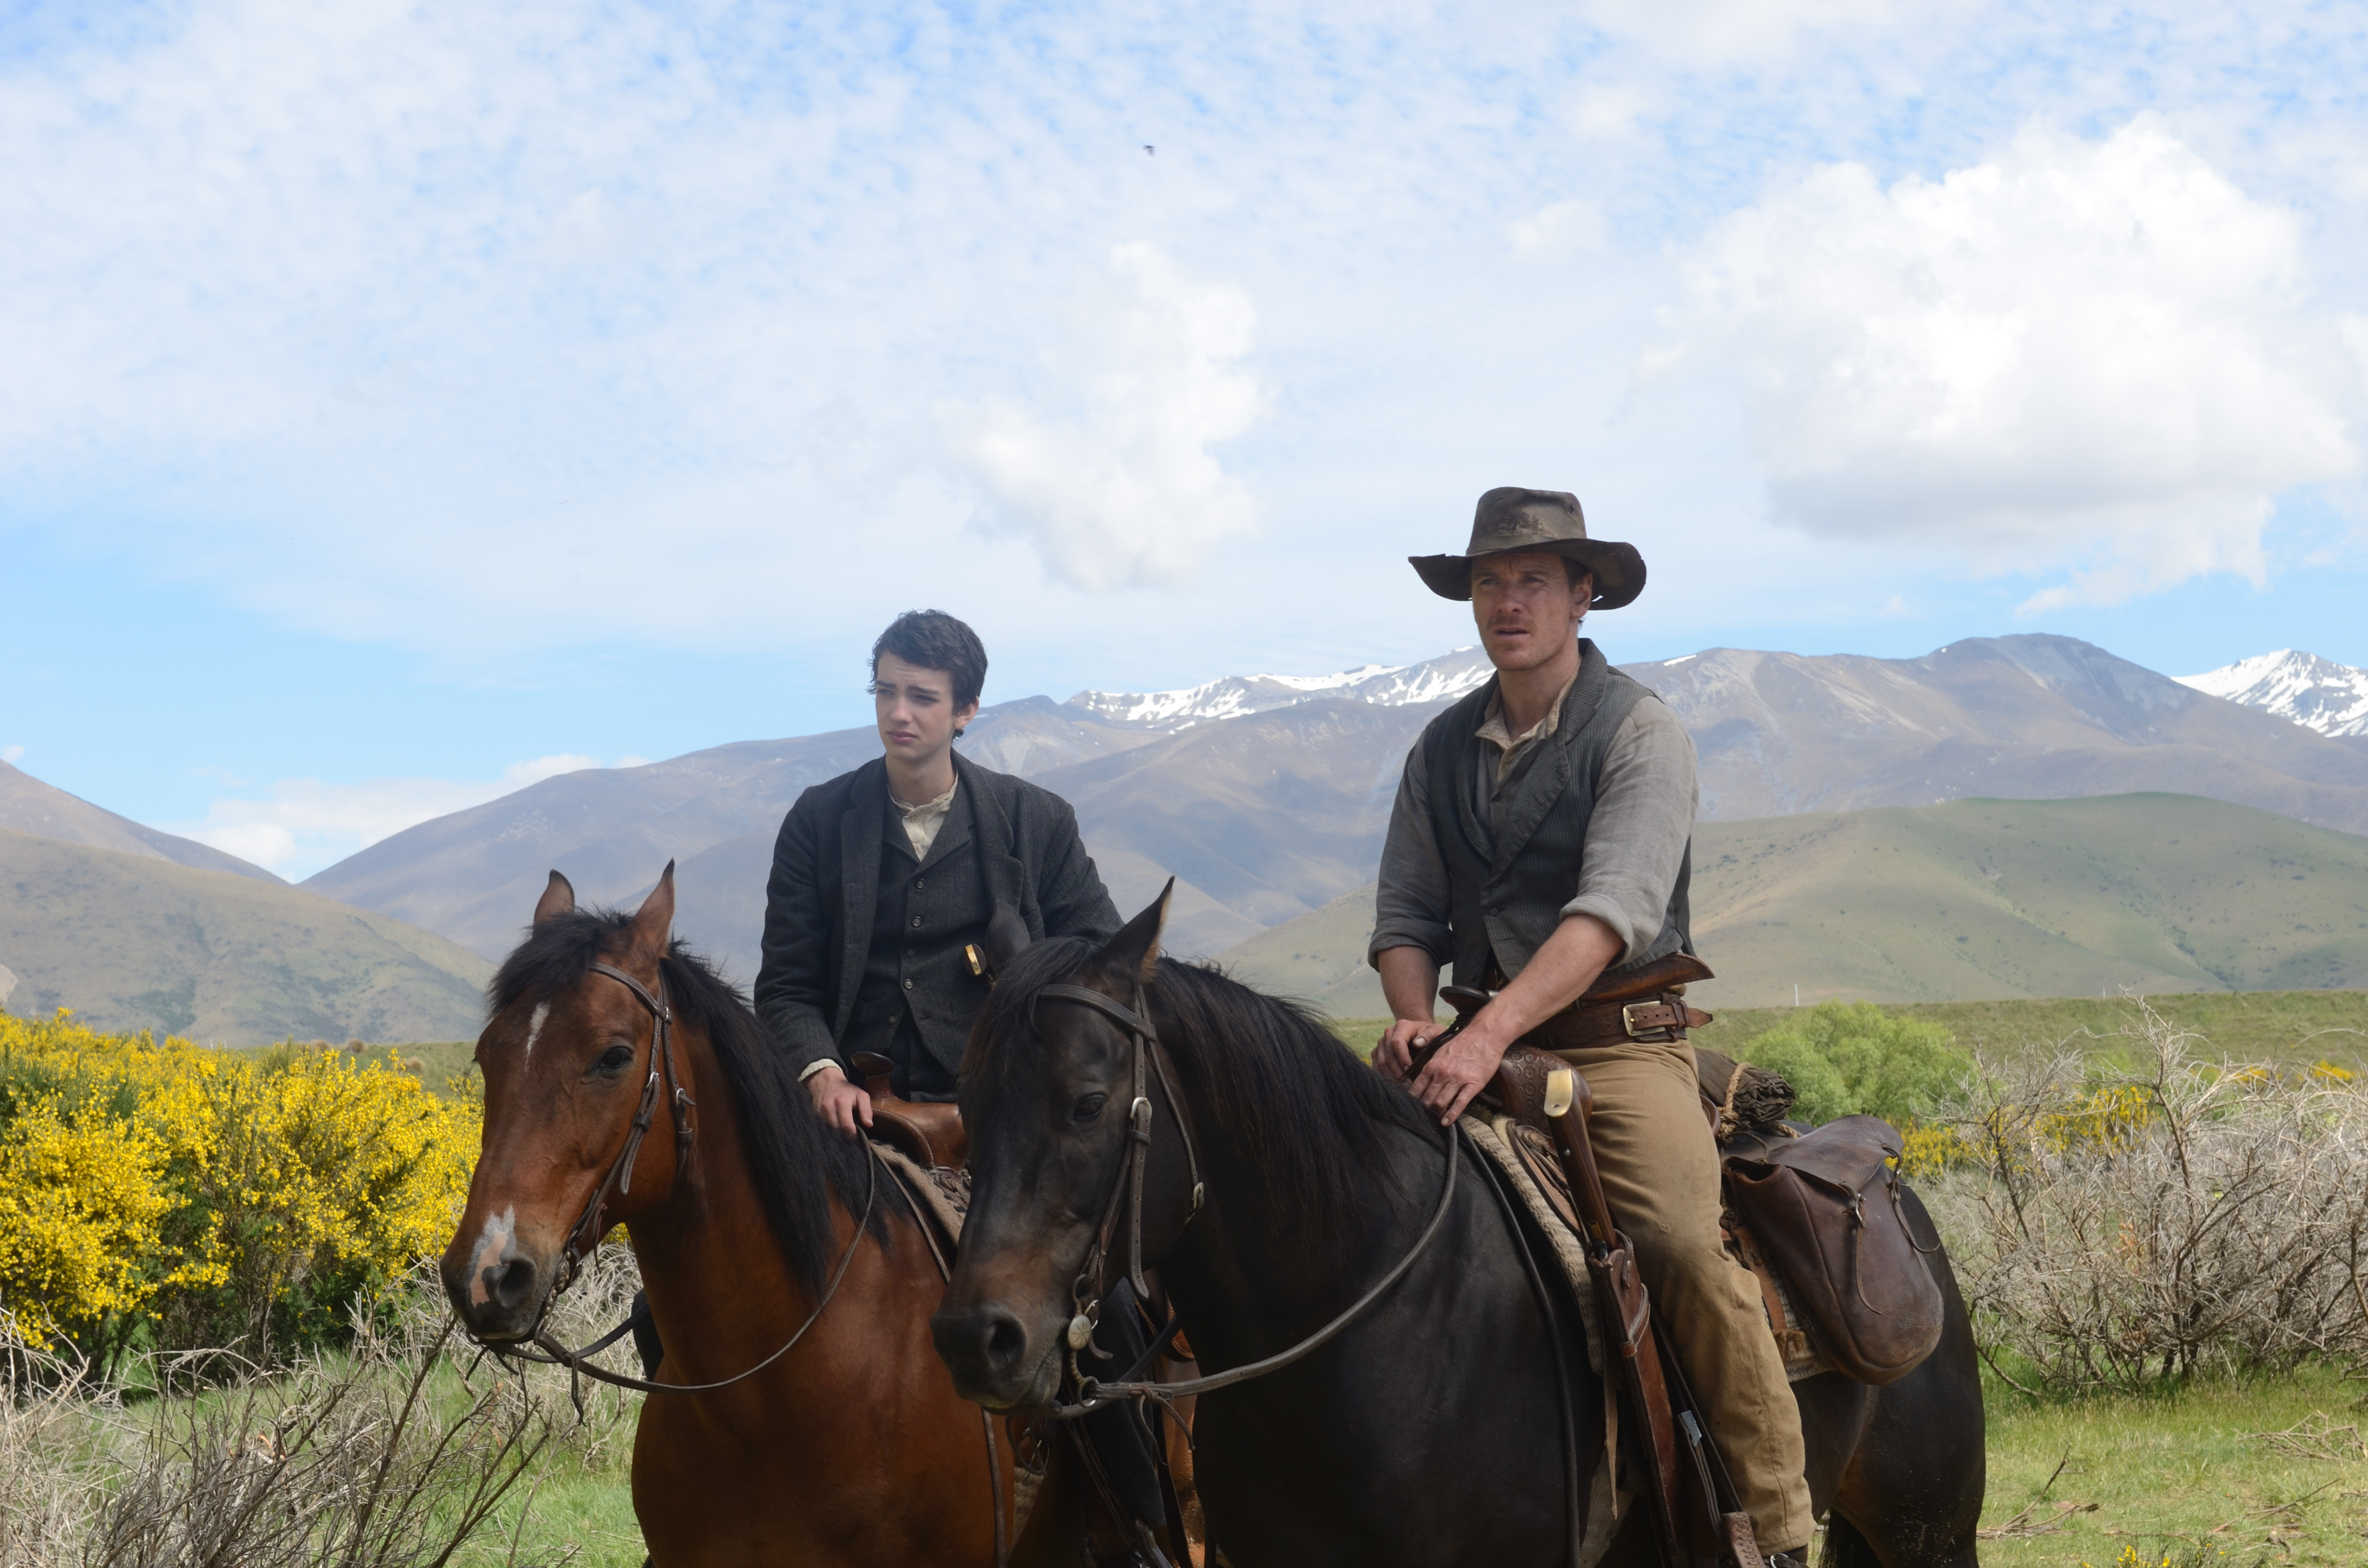 Michael Fassbender and Kodi Smit-McPhee in Slow West (2015)